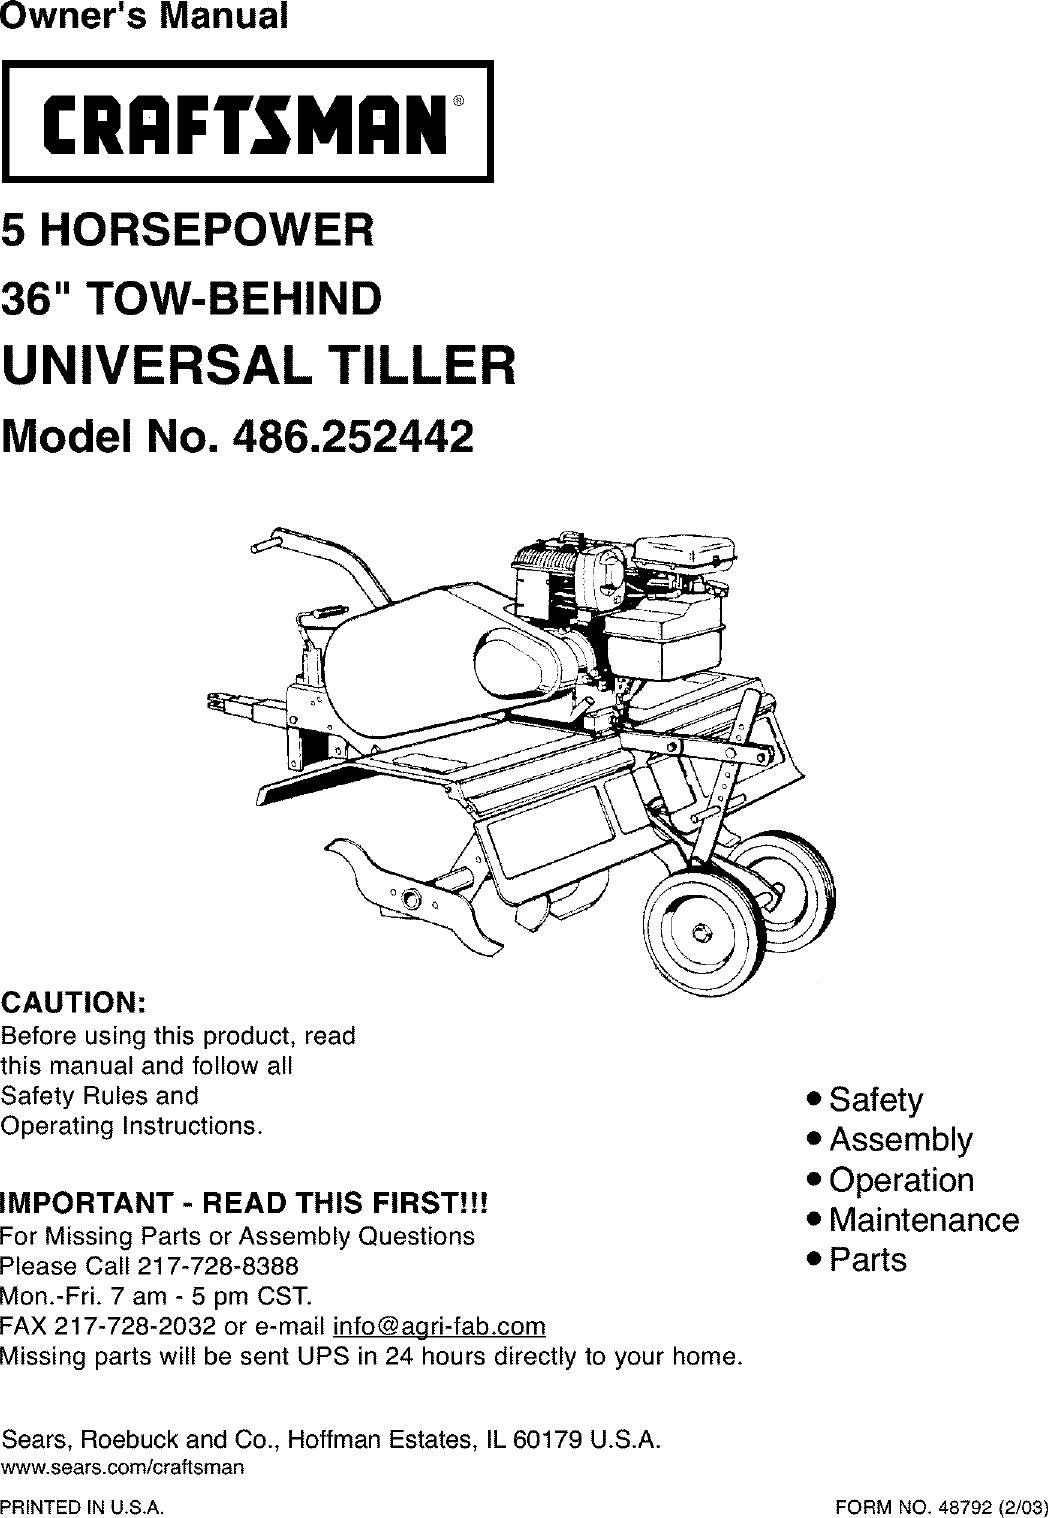 Craftsman 486252442 user manual tiller manuals and guides l0303051.